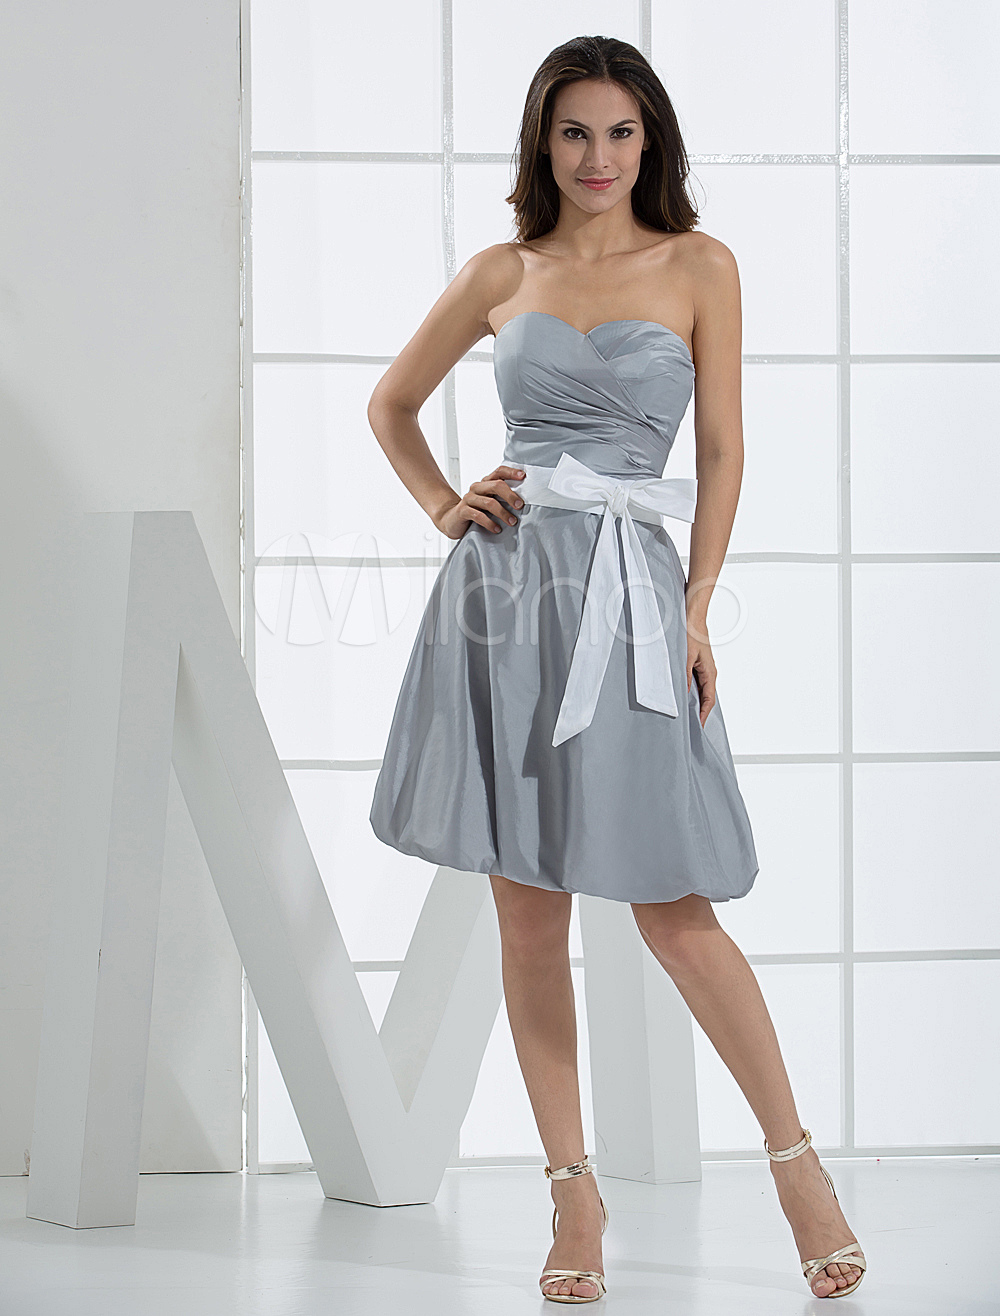 Silver Prom Dress Strapless Backless Sash Bow Taffeta Dress (Wedding Cheap Party Dress) photo